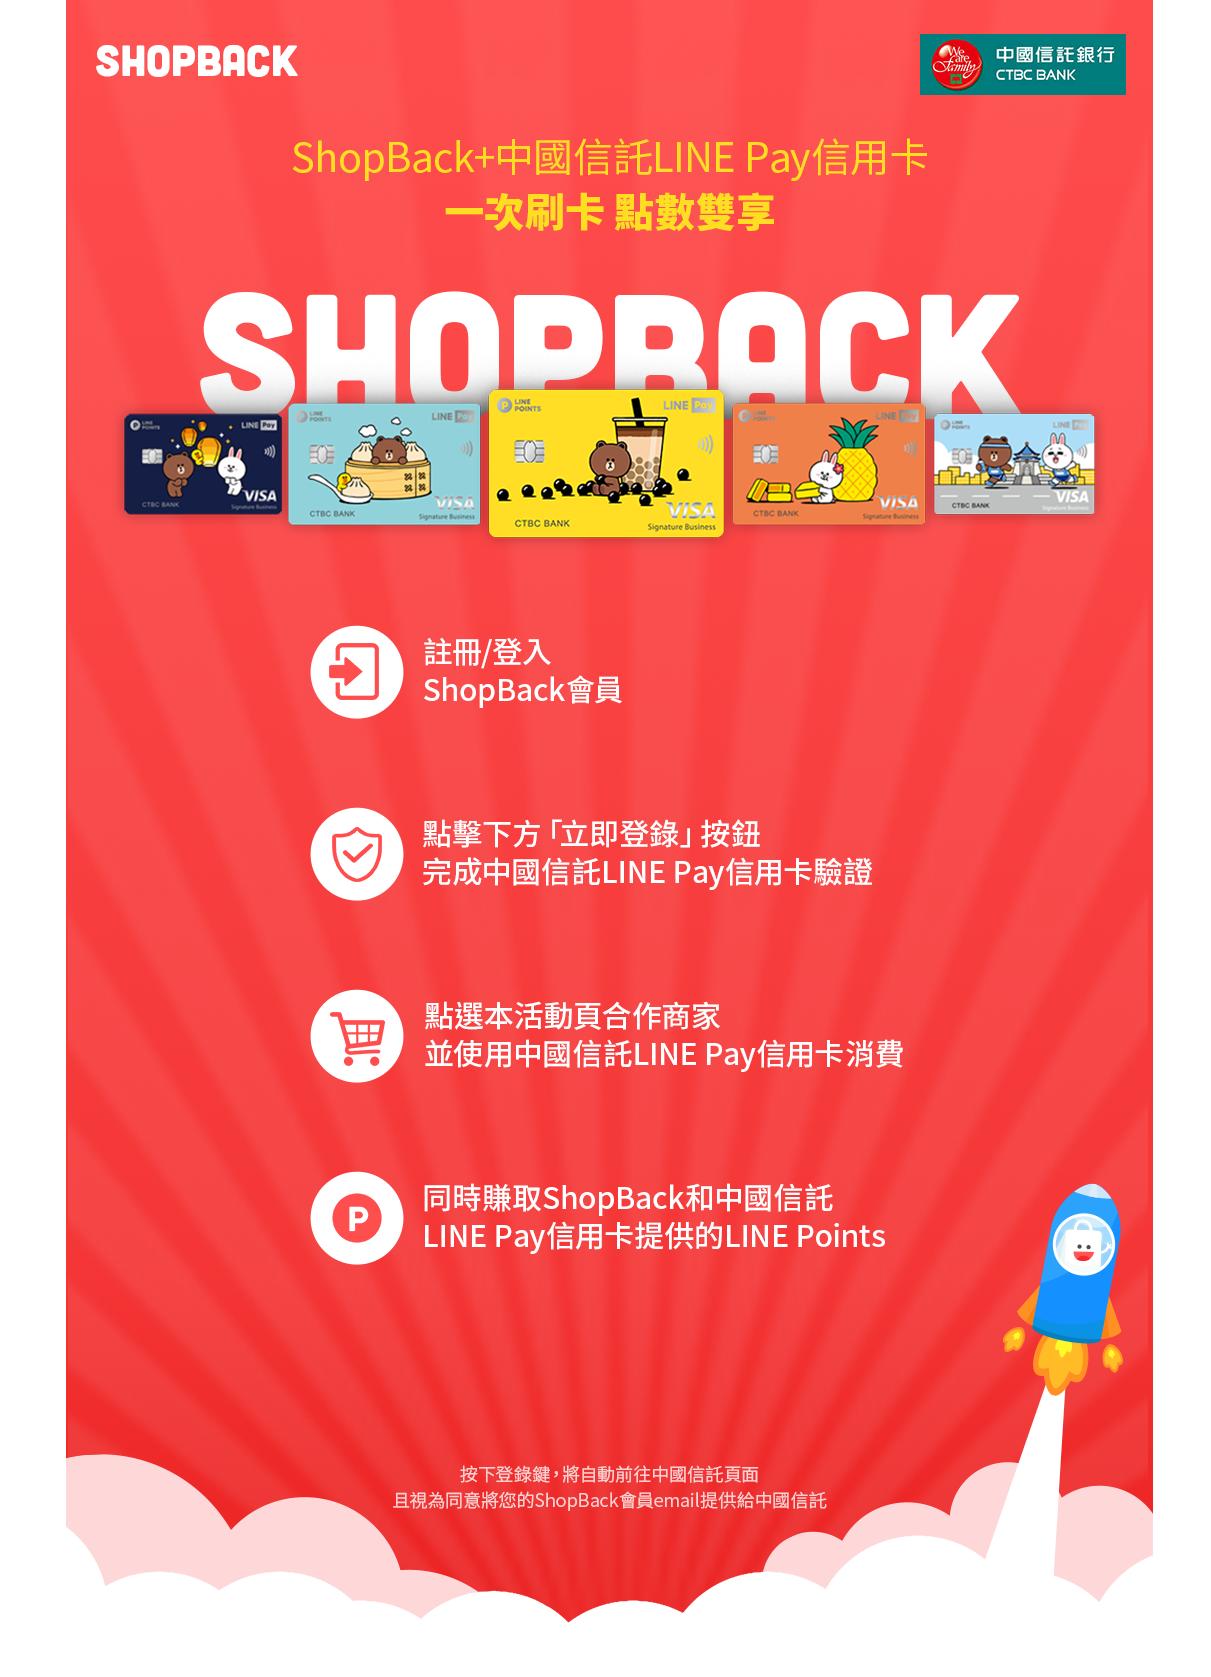 CTBC Shopback - Introduction banner